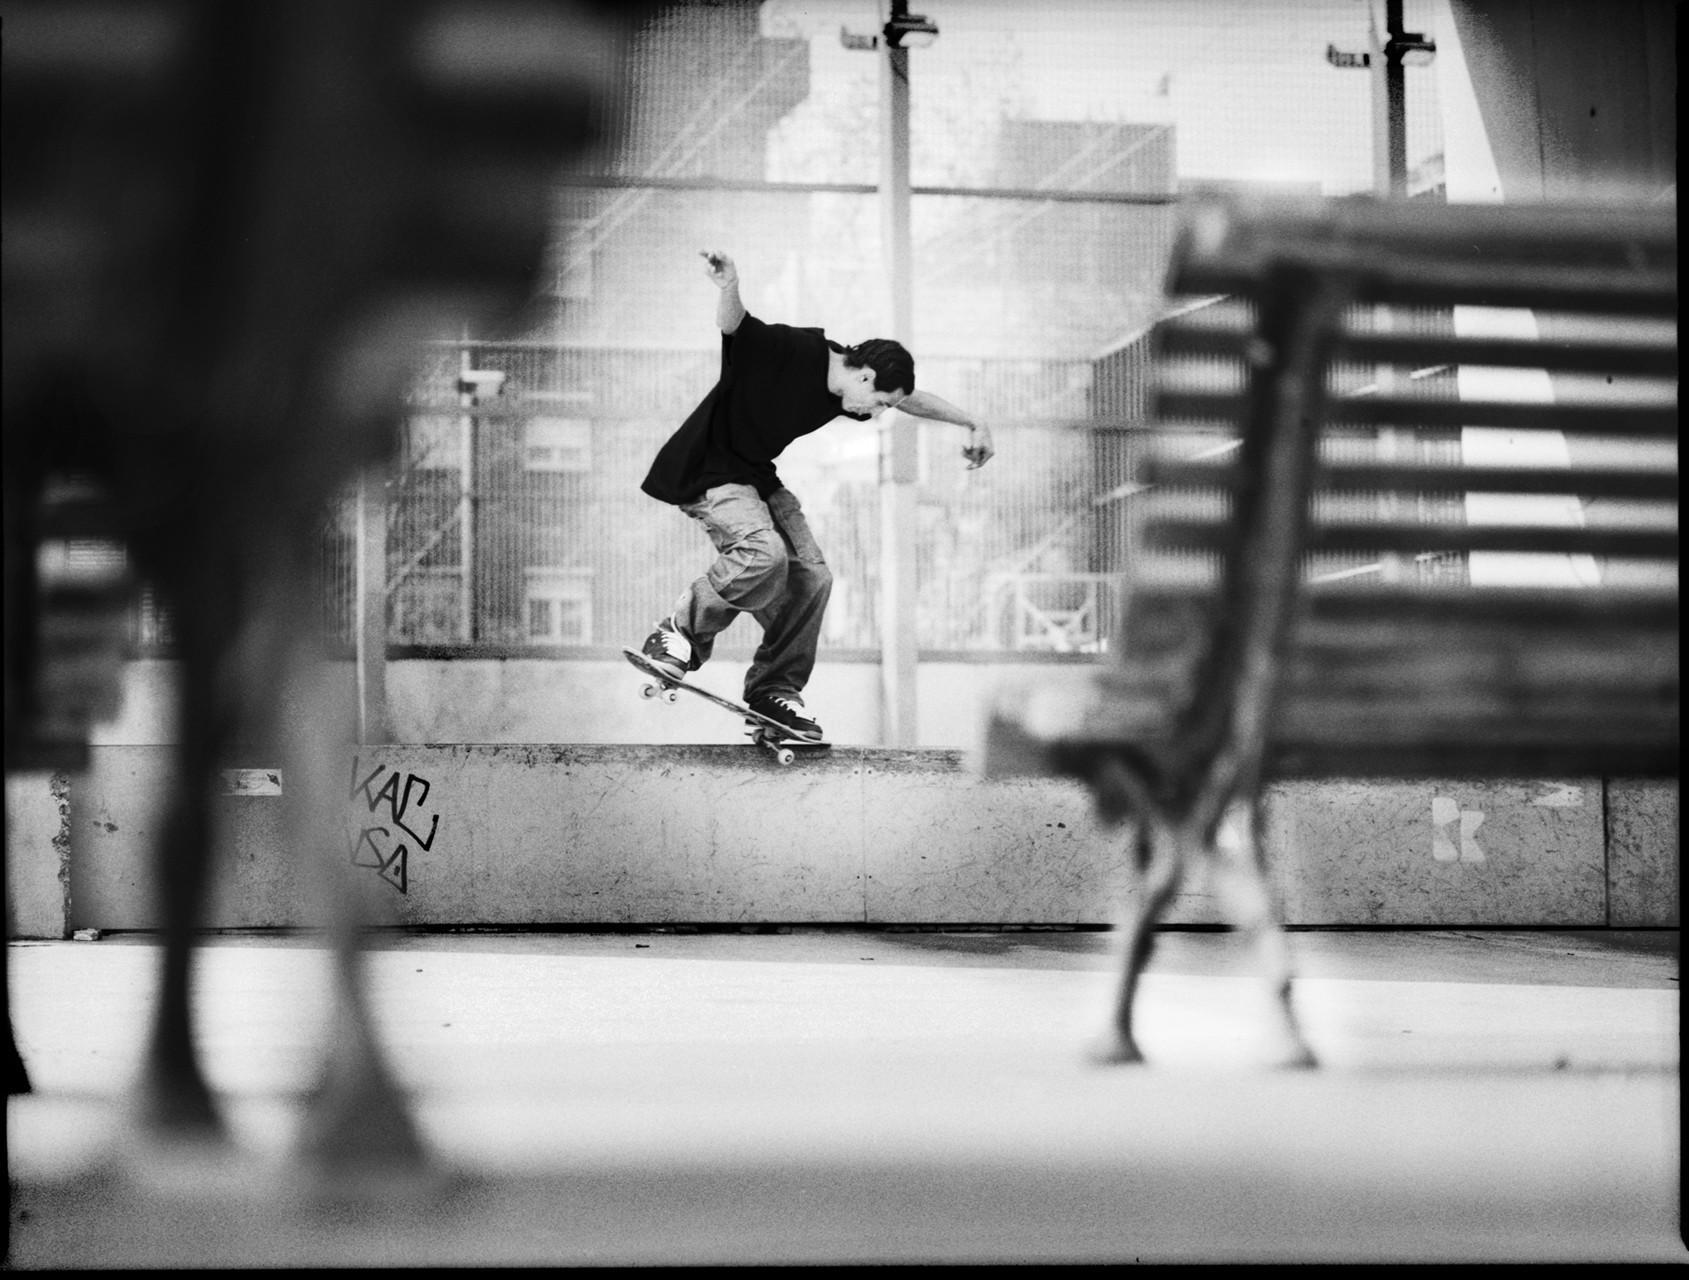 SKATE-STREET-PHOTOGRAPHY-30-JUANMI-MARQUEZ-1761x1280-1761x1280